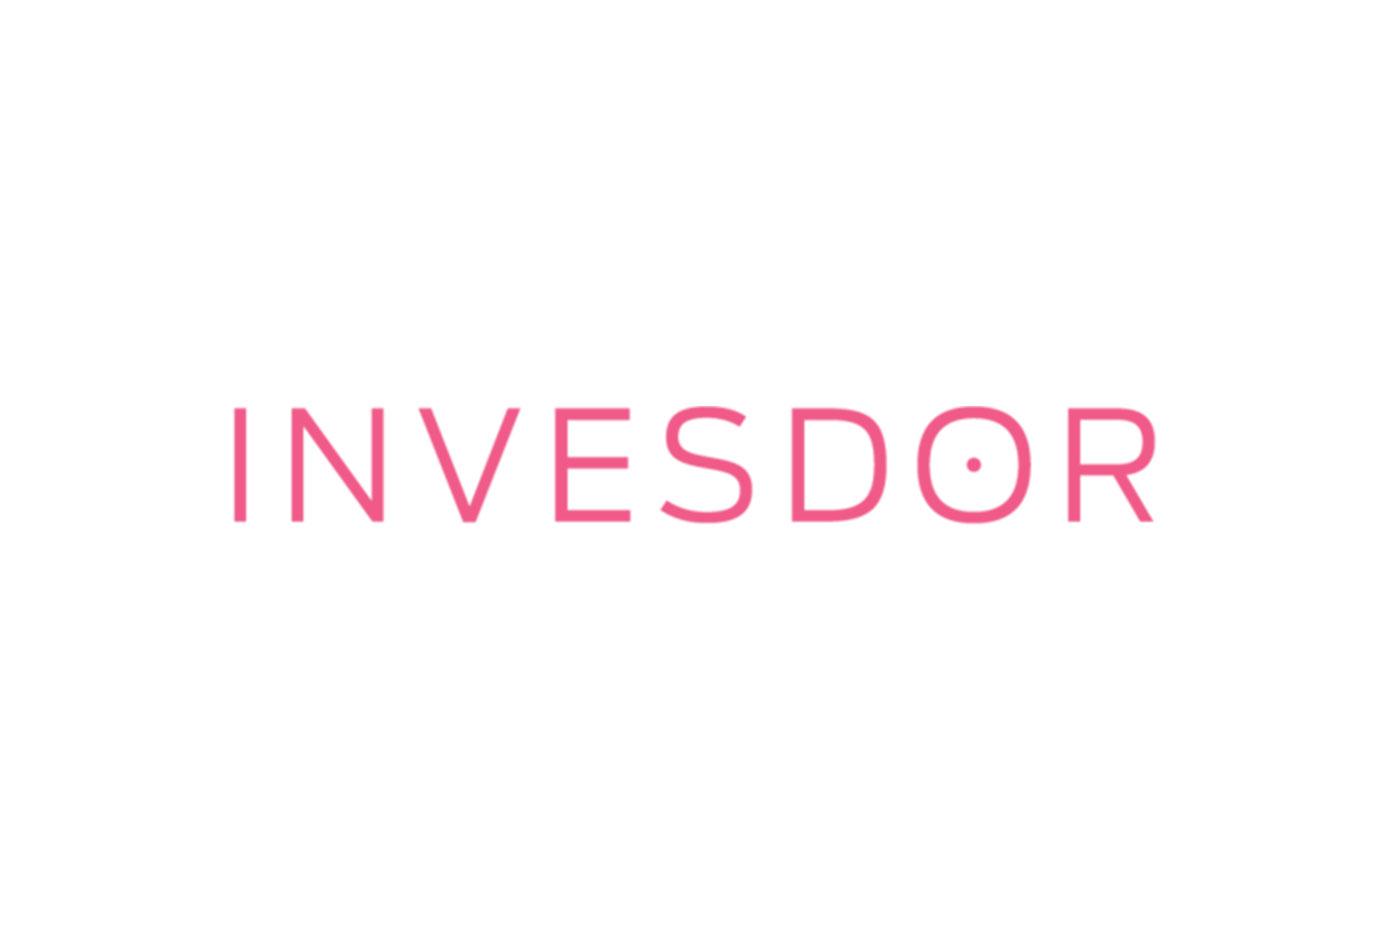 Invesdor